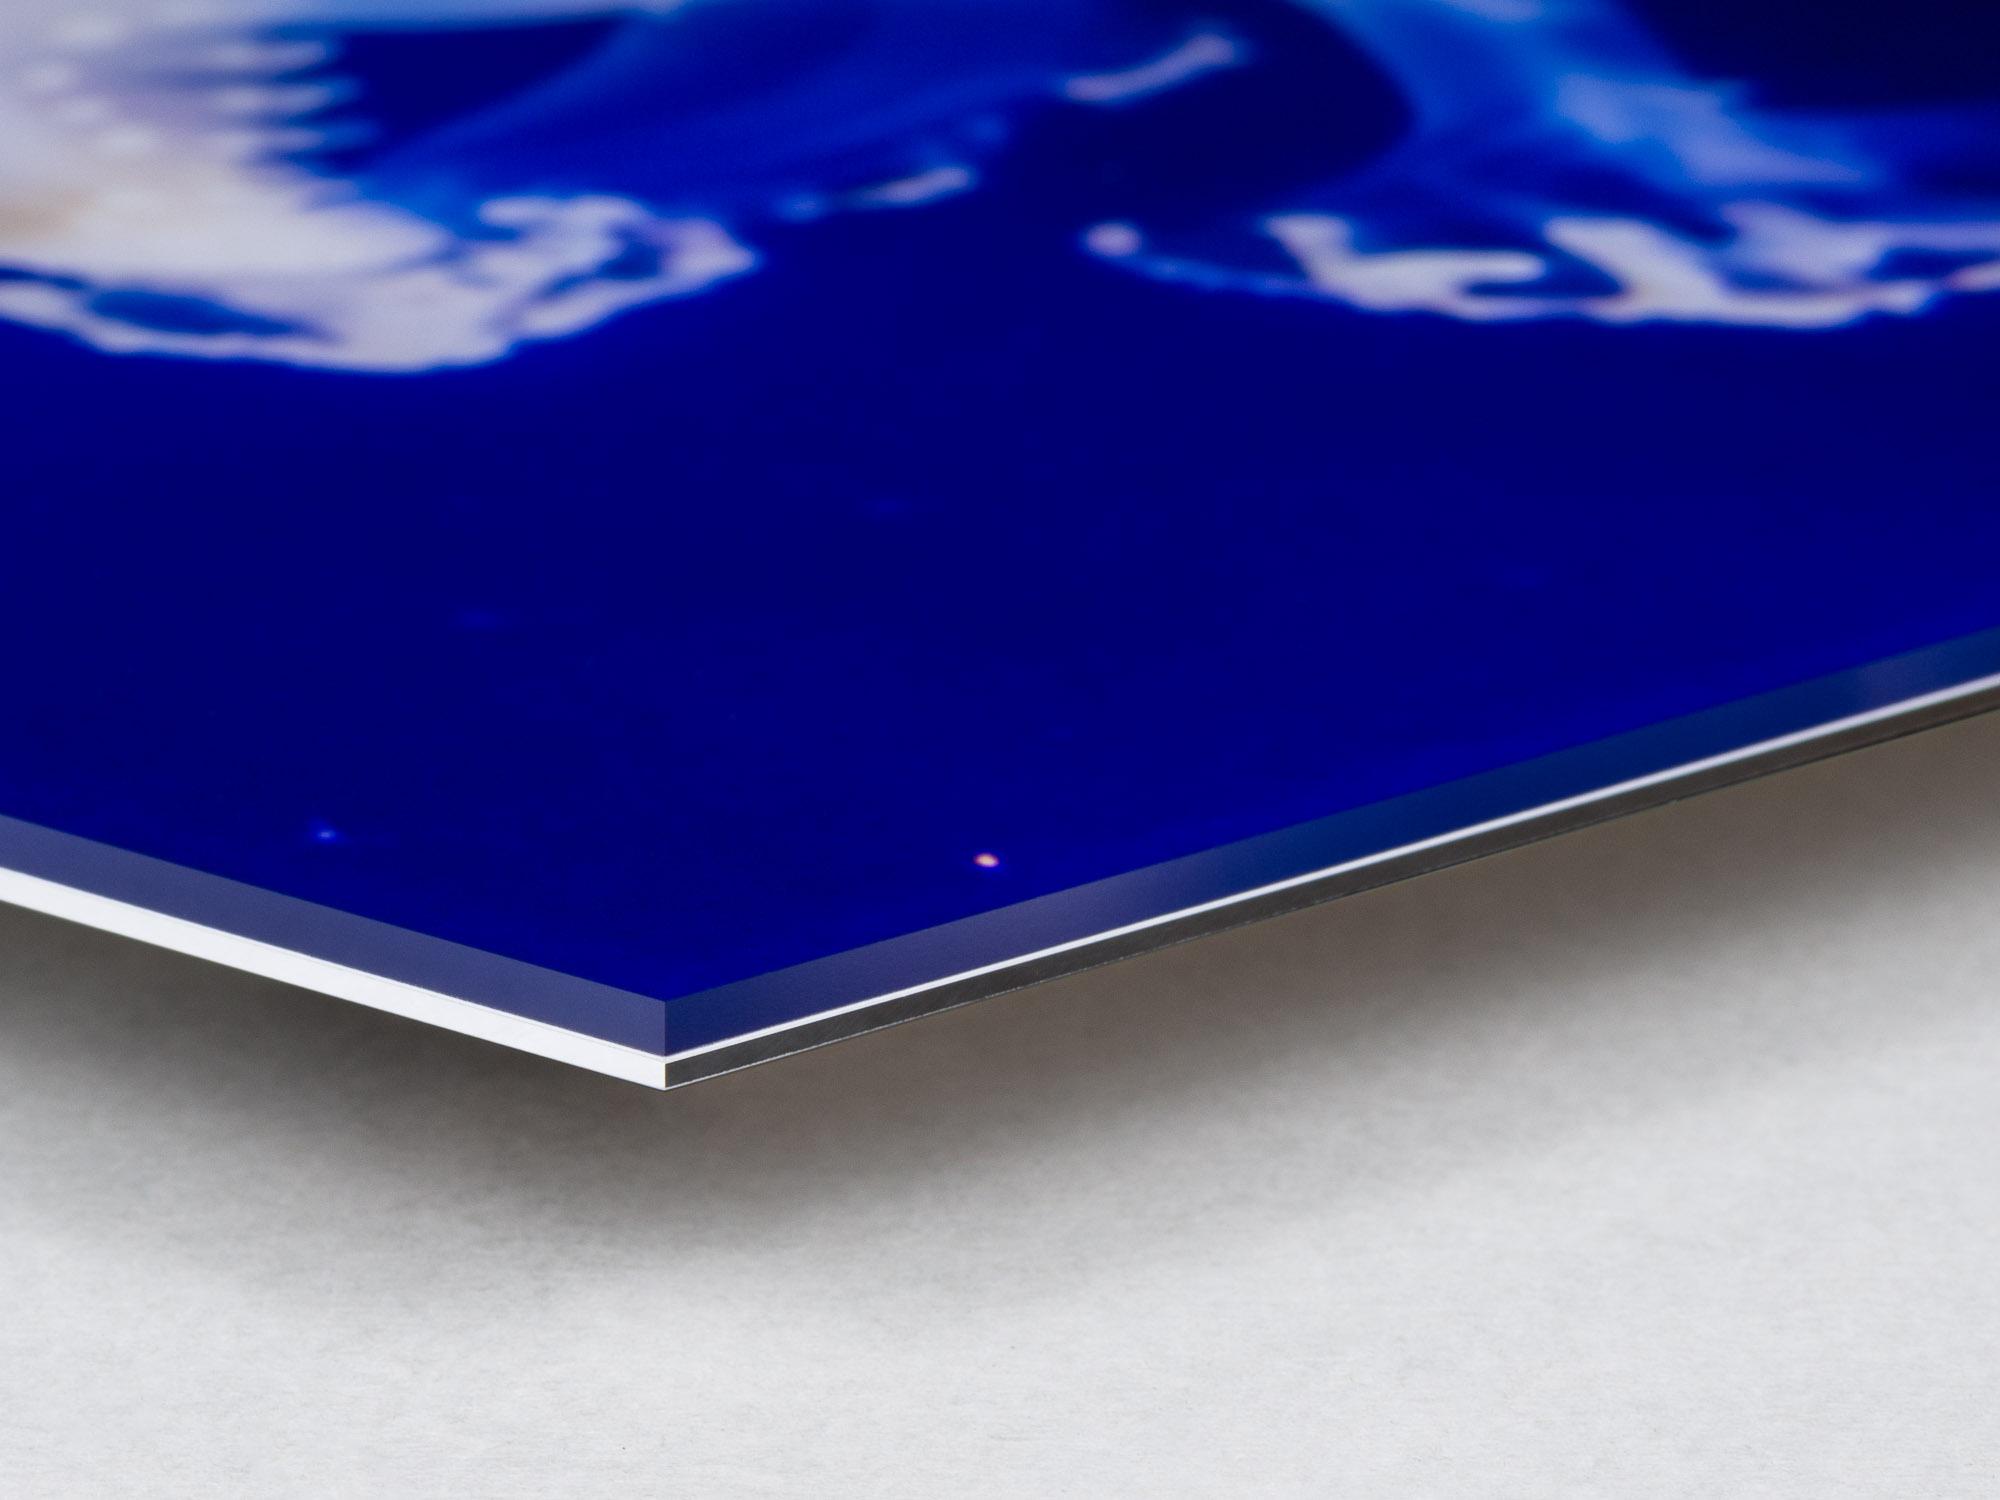 fotomontering p matt plexiglas med gallerikvalit crimson. Black Bedroom Furniture Sets. Home Design Ideas